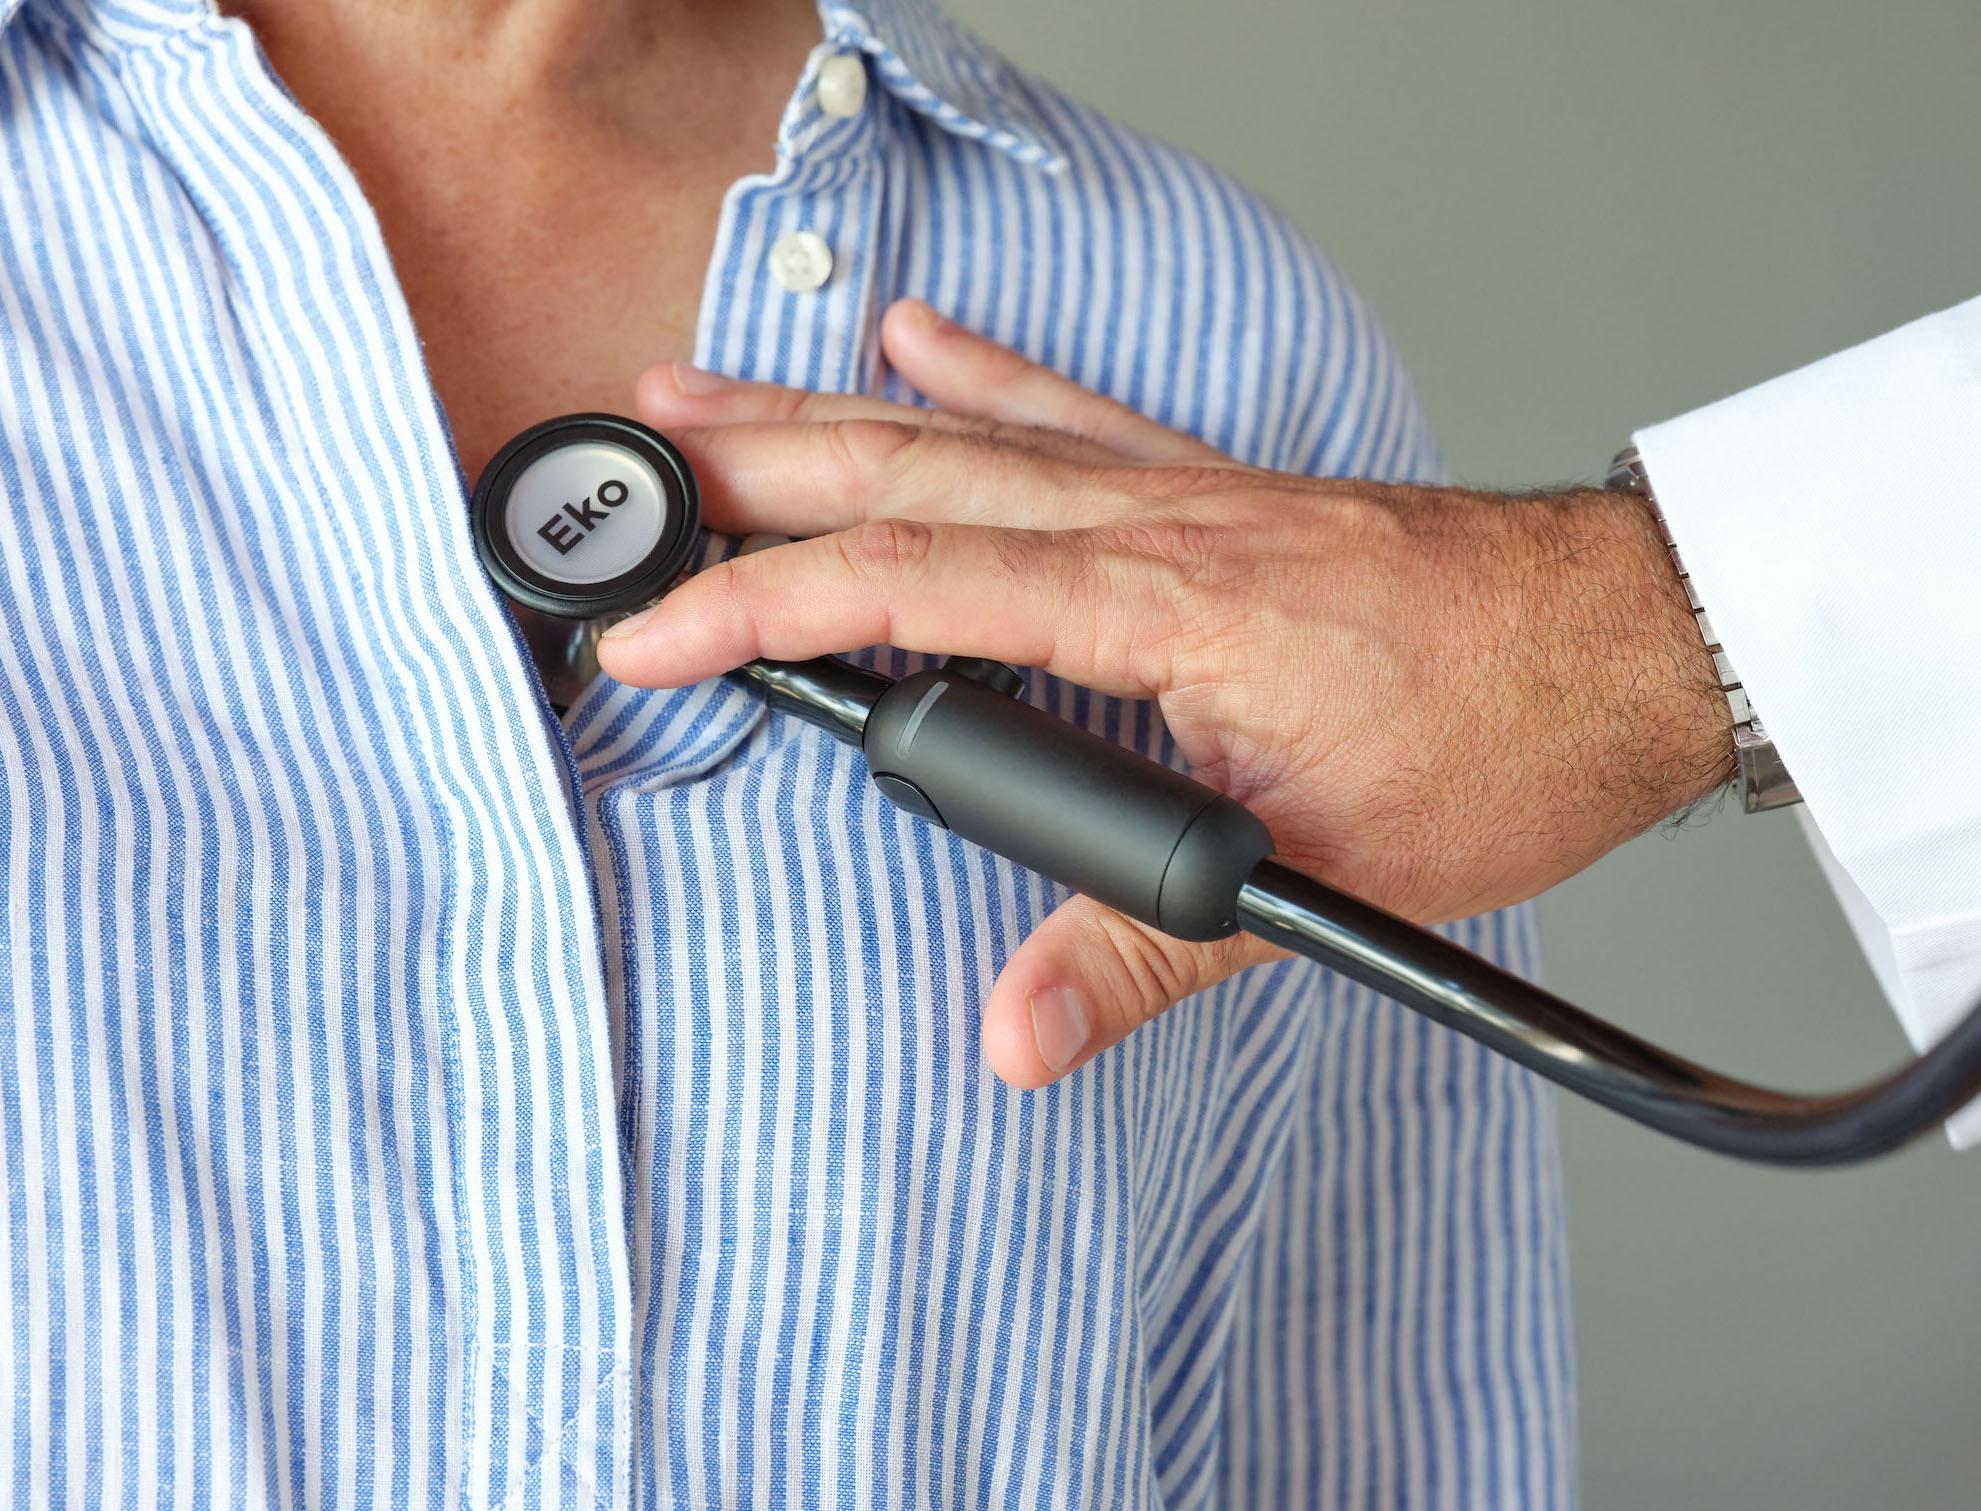 Eko Unveils Redesigned Smart Stethoscope and Stethoscope Attachment